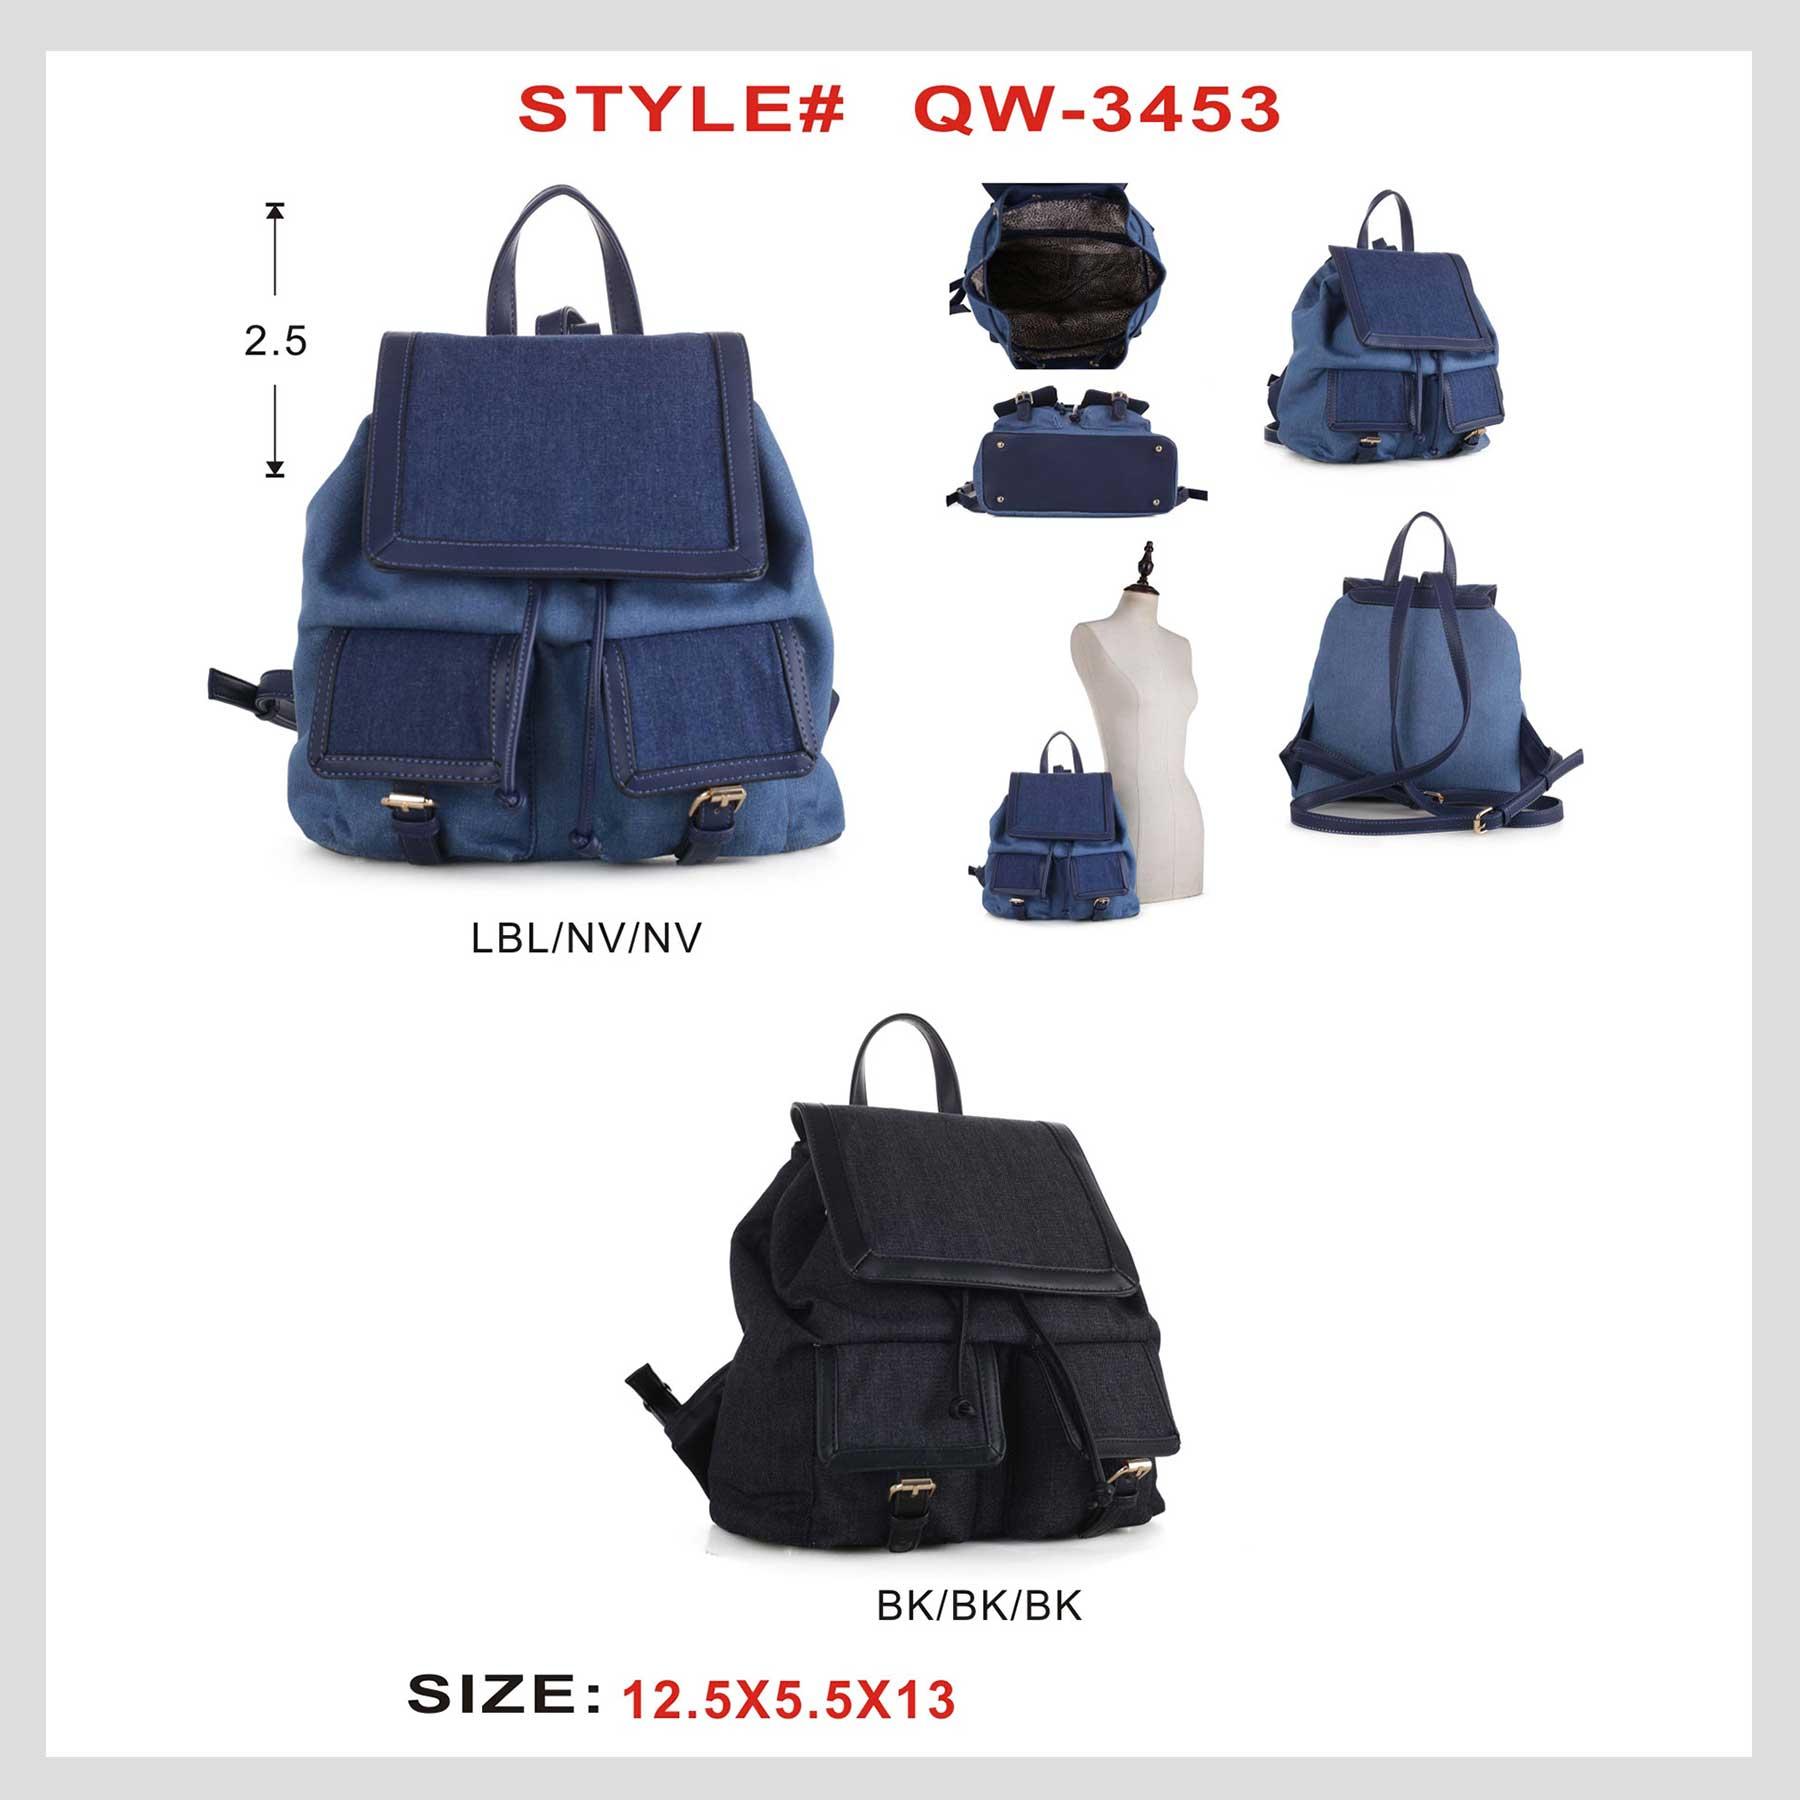 QW-3453.jpg